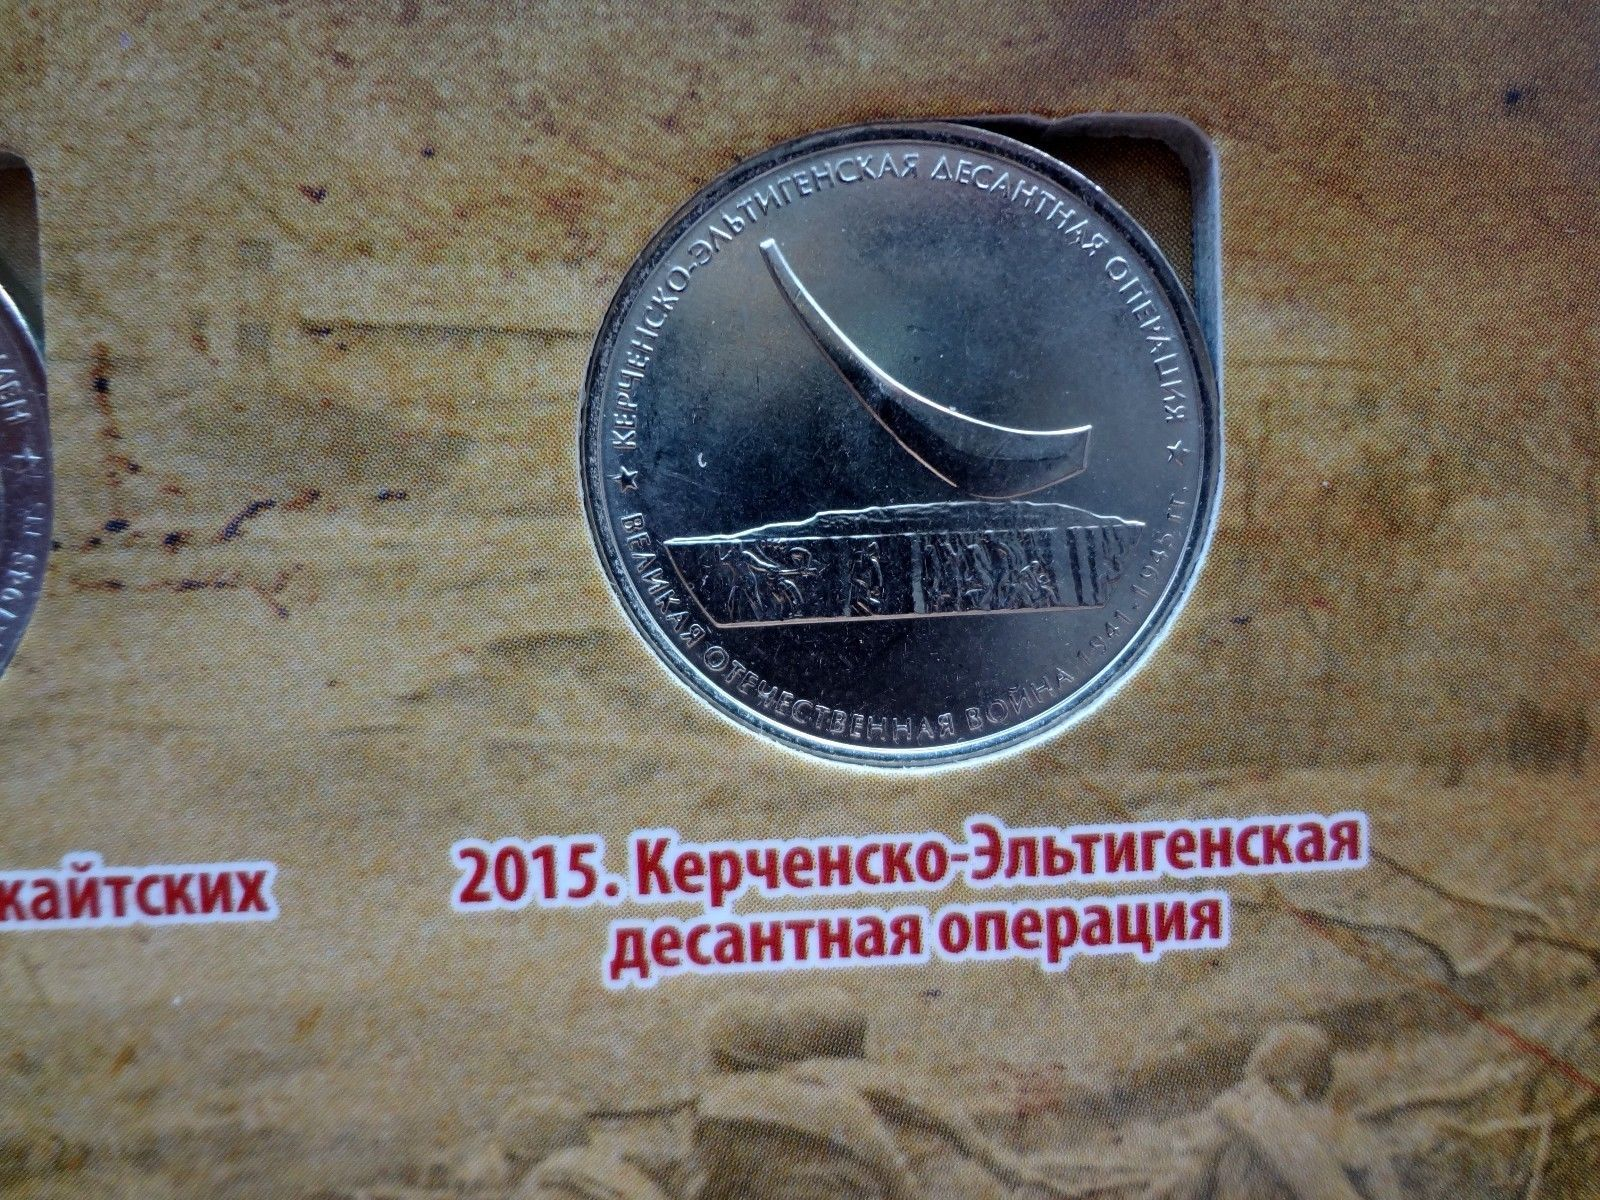 Russia 2015 100 roubles Crimea and Sevastopol CK series UNC RU105